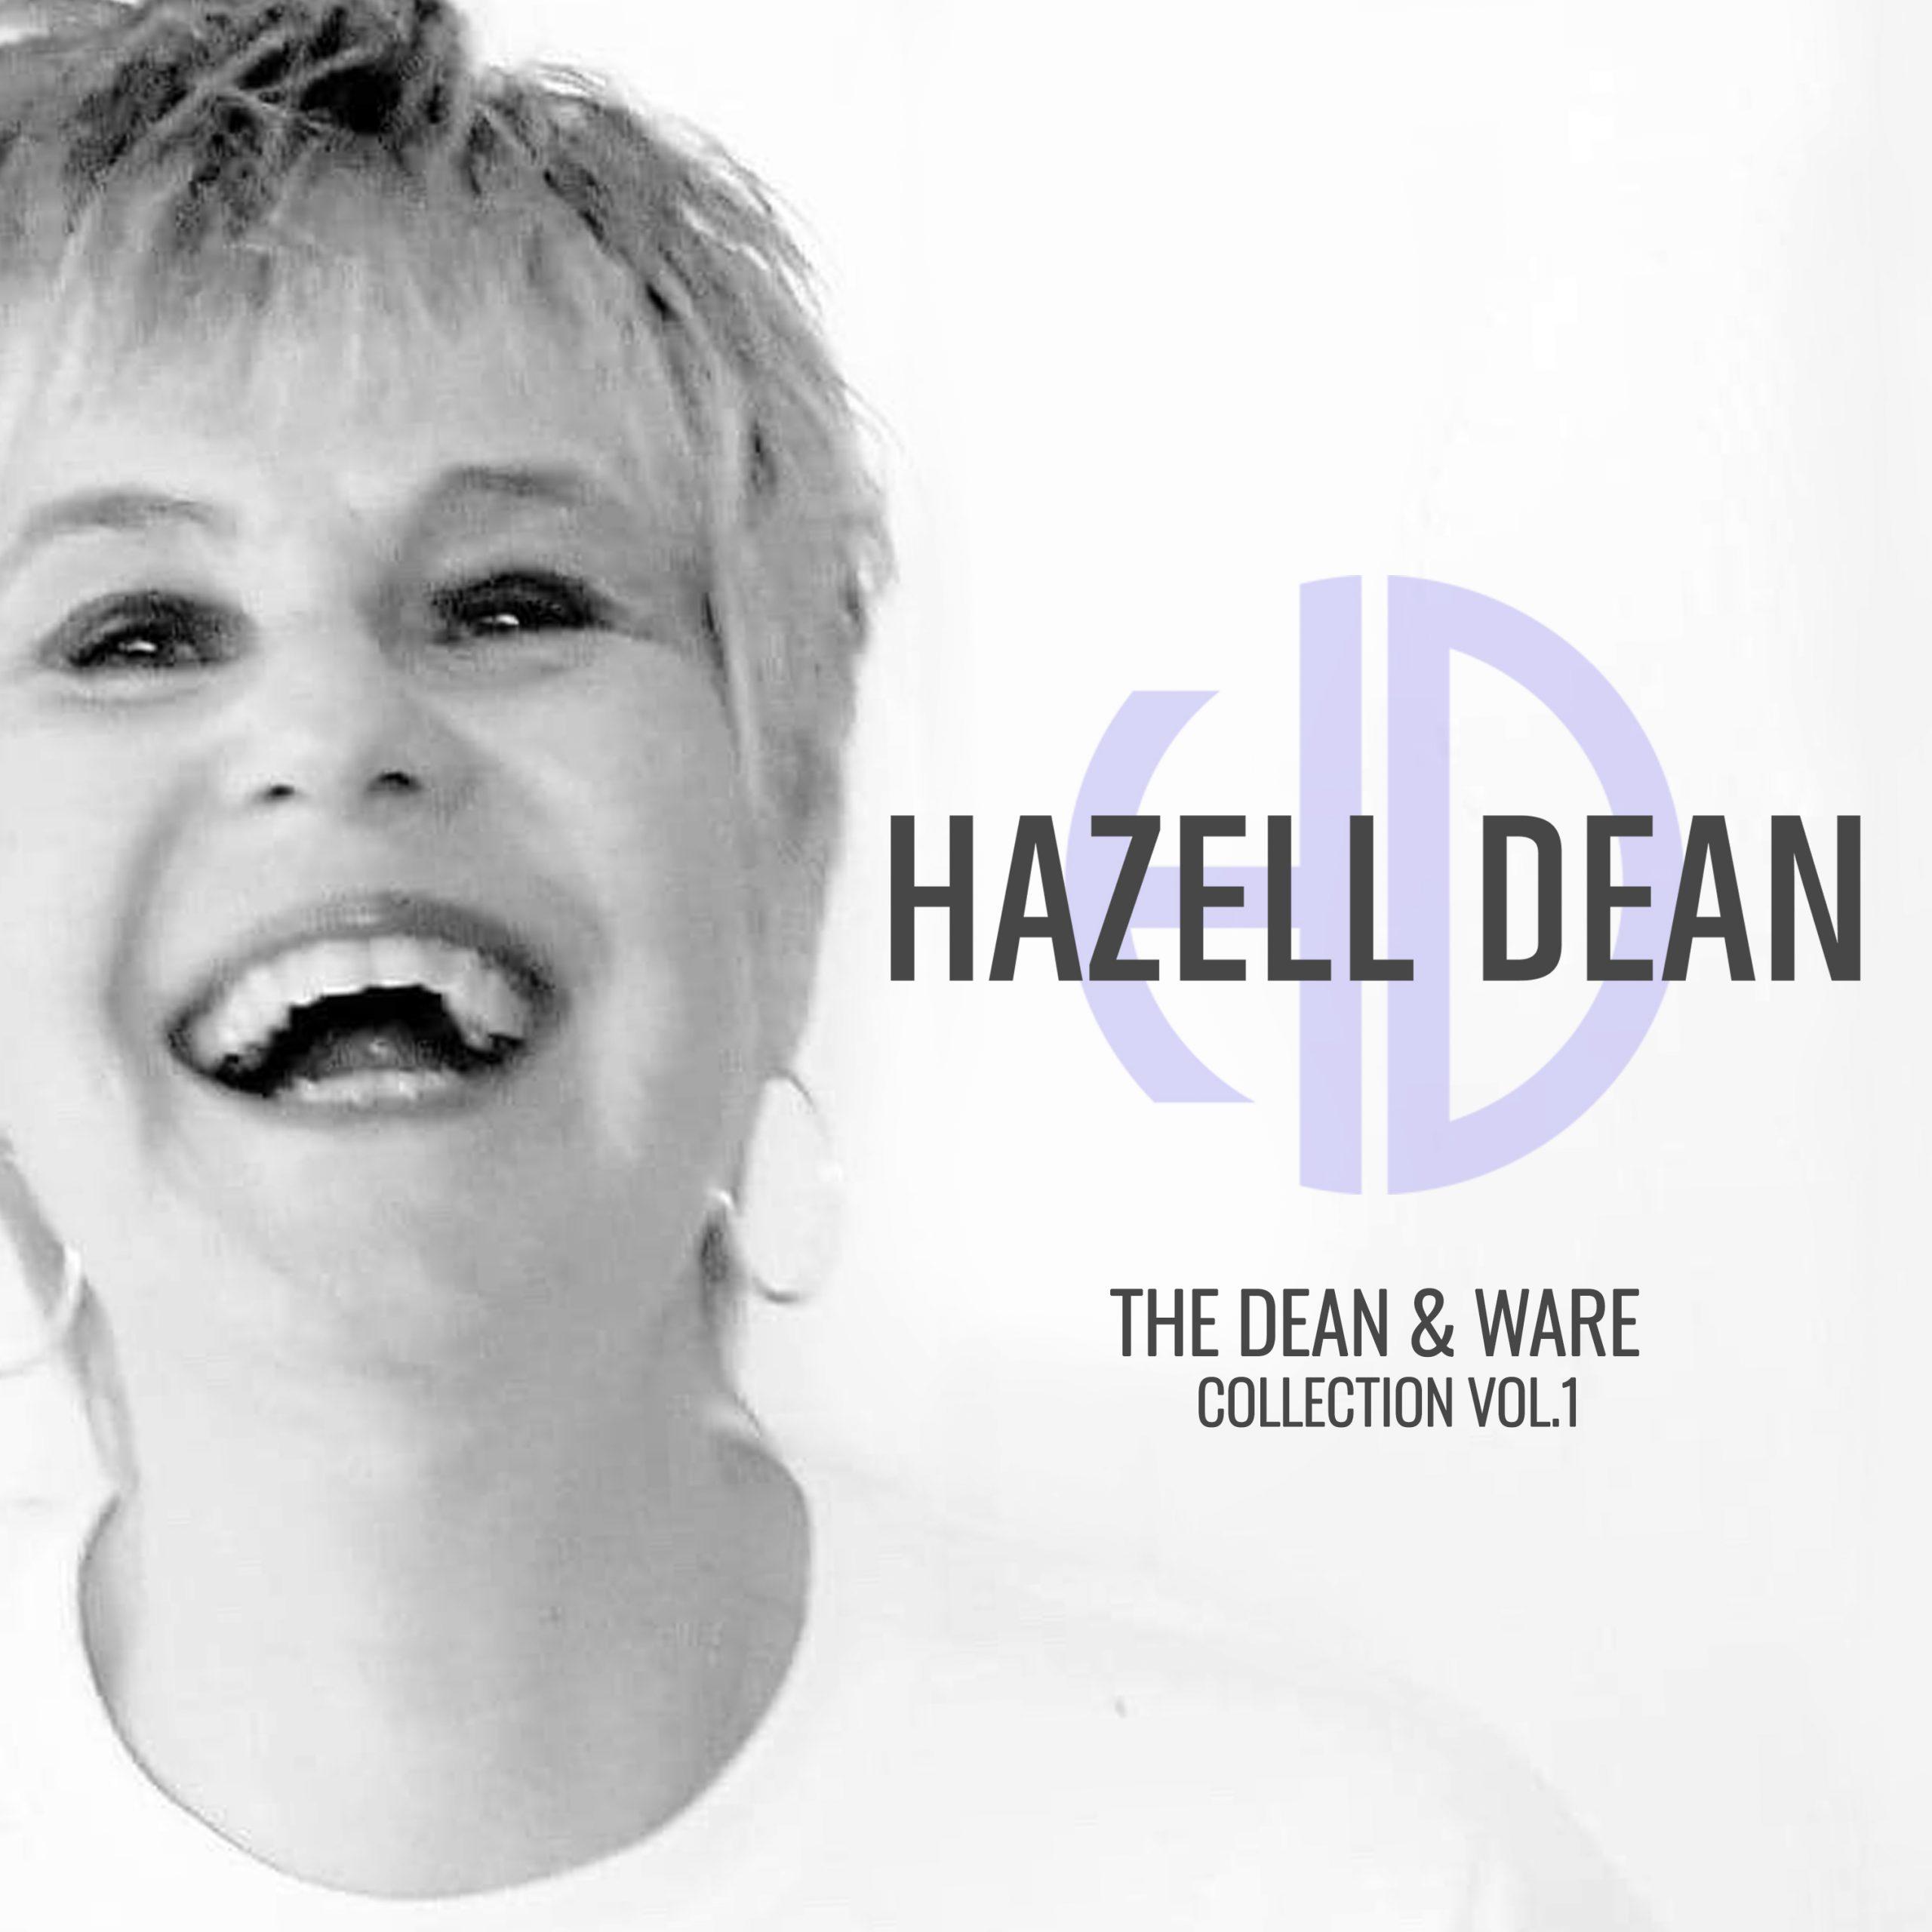 Dean & Ware Collection Vol. 1